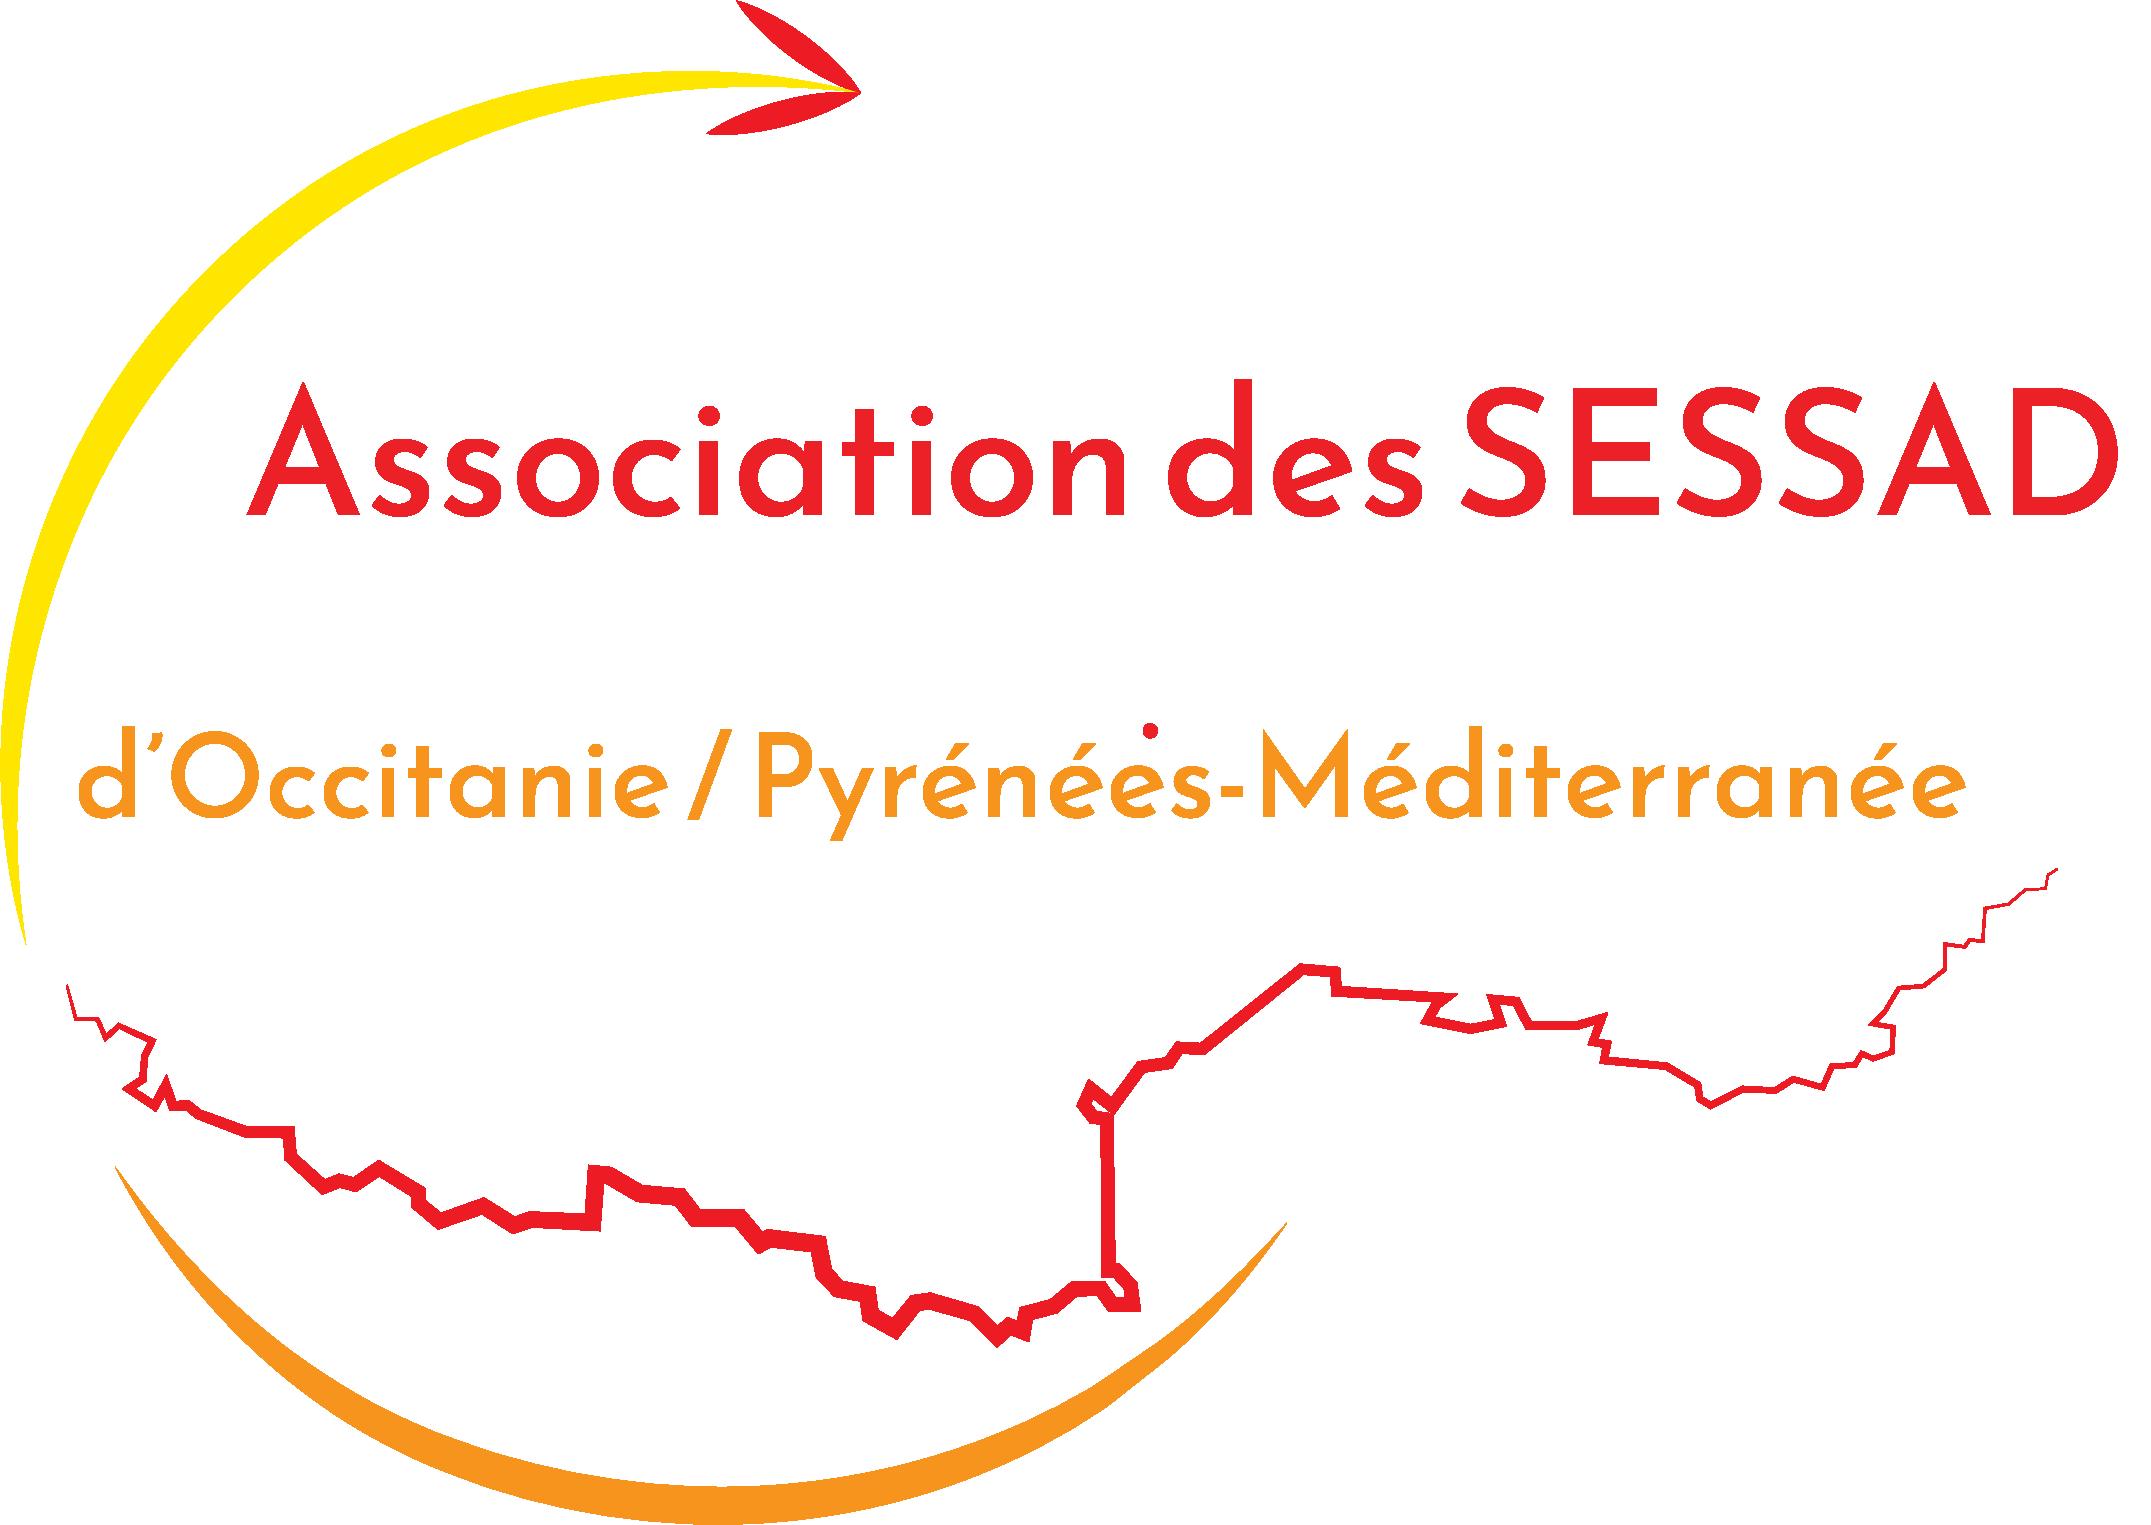 Association des SESSAD d'Occitanie / Pyrénées – Méditerranée Logo